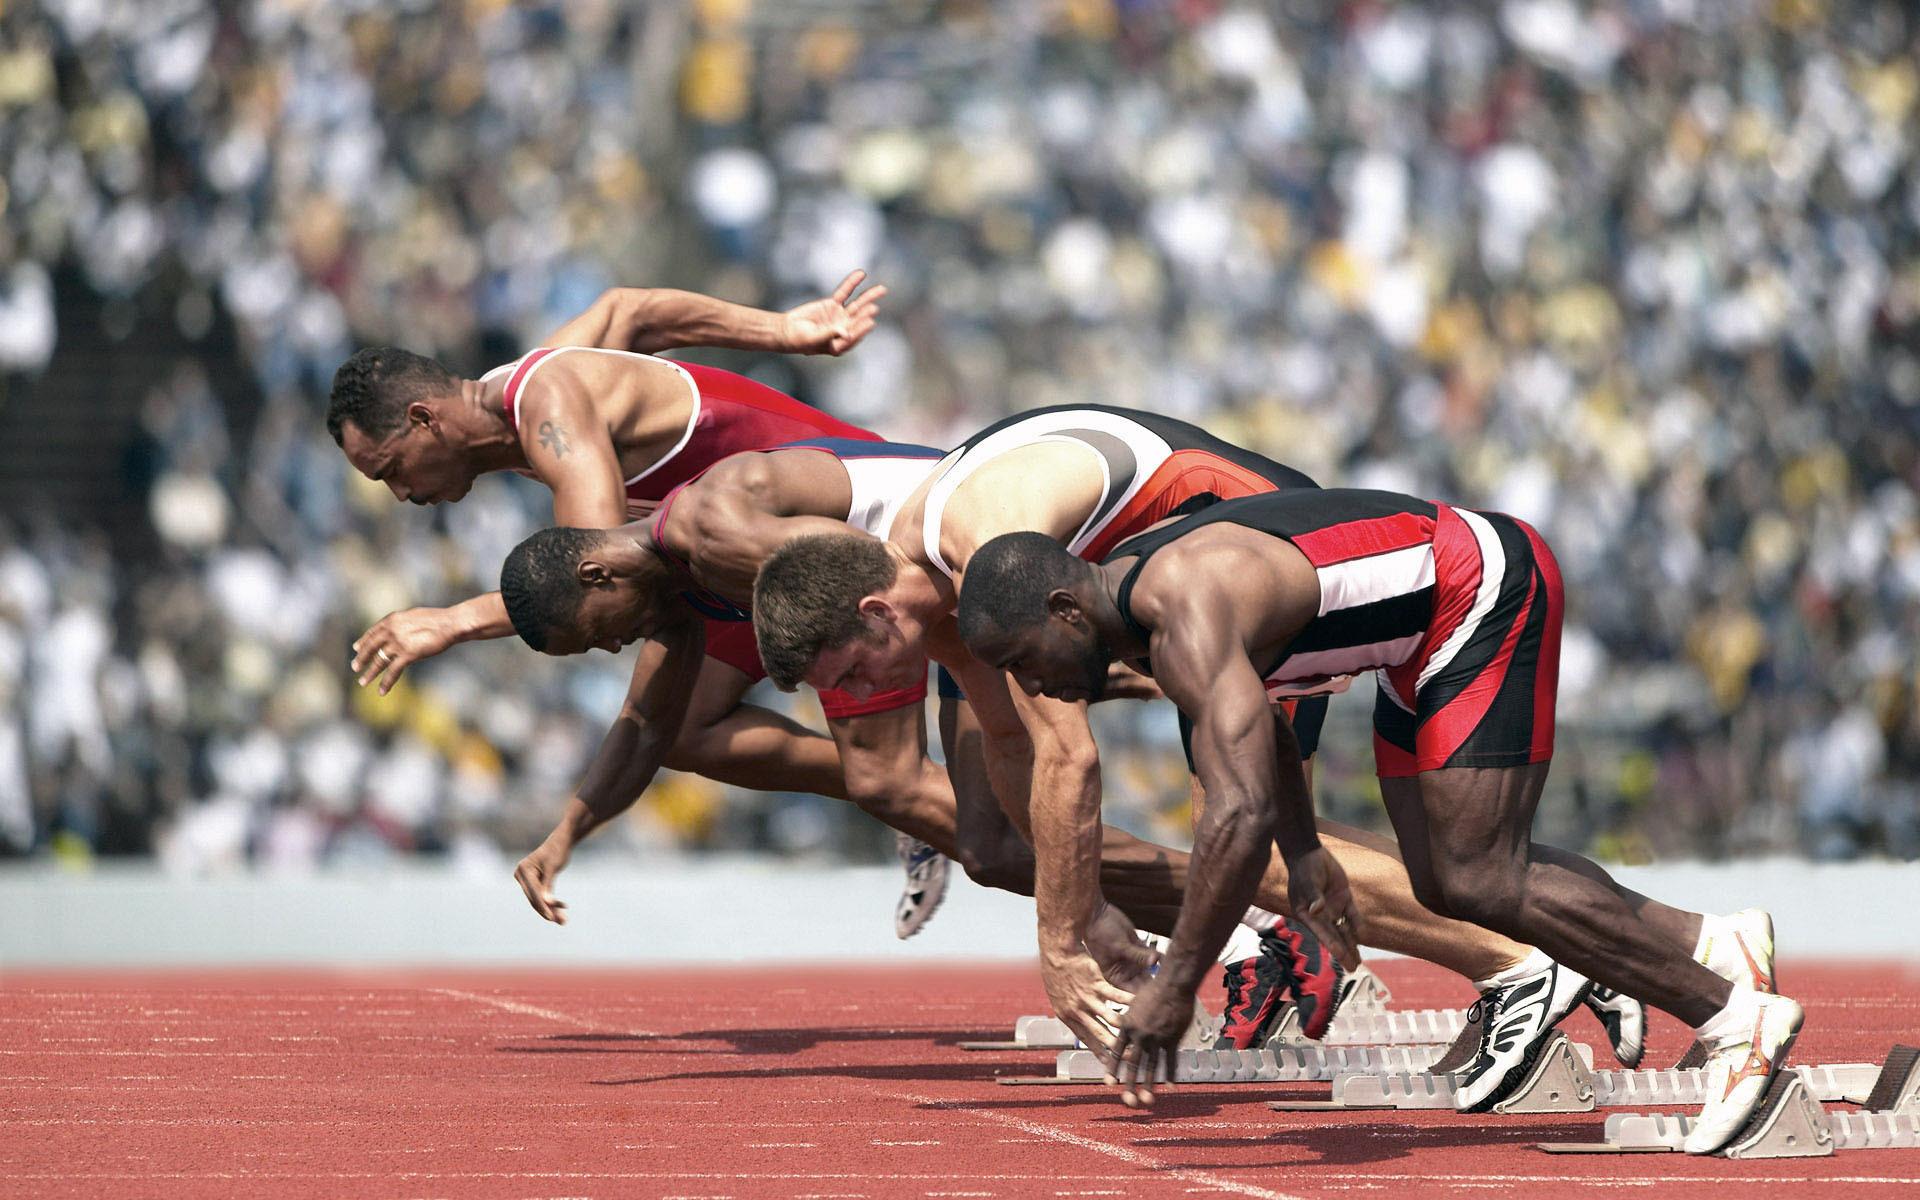 Картинка про спортсменов, открытки